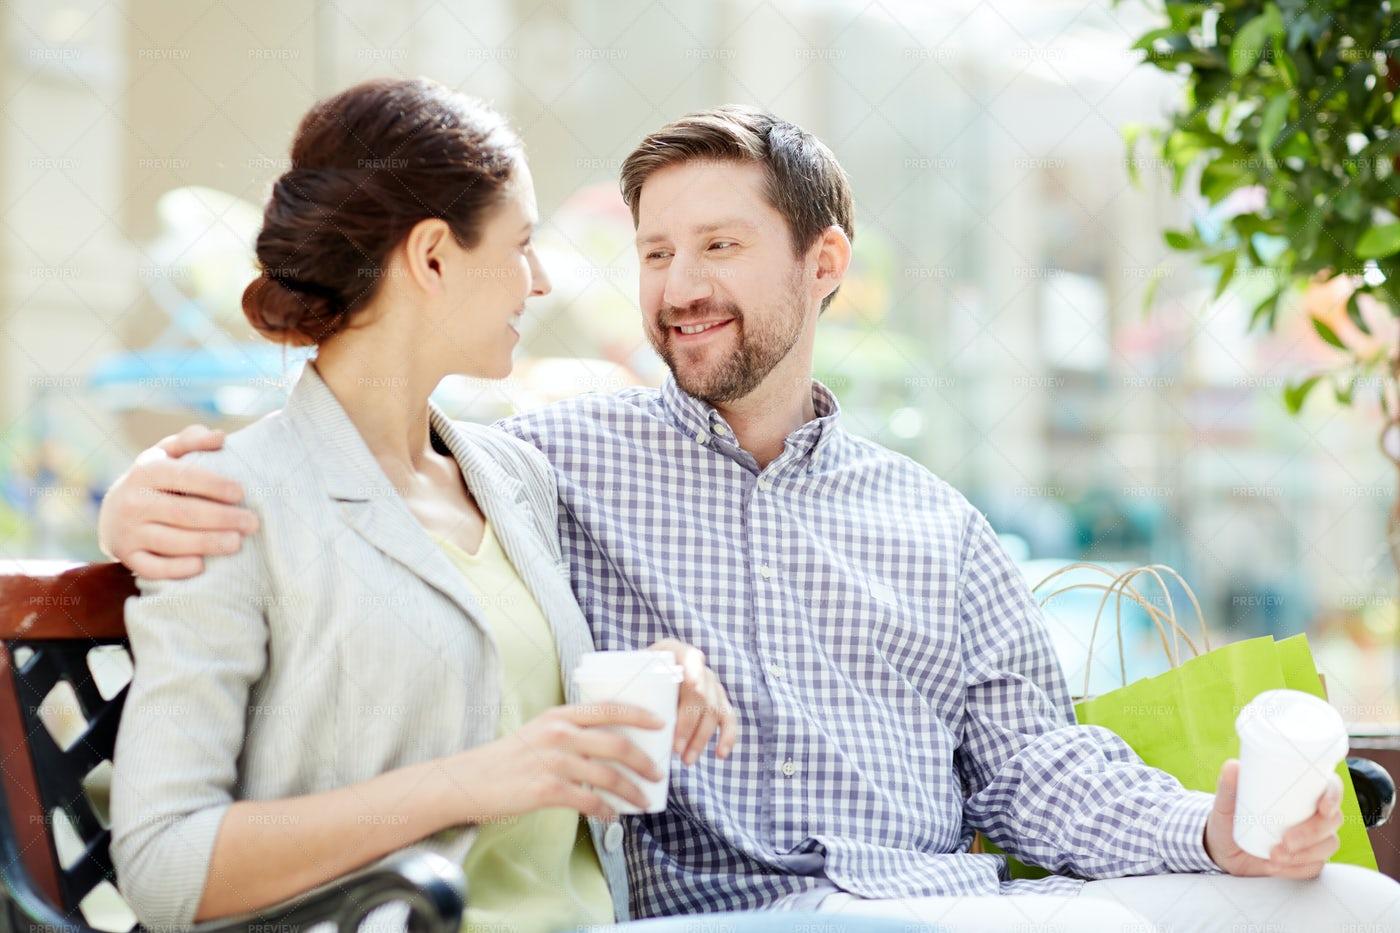 Talking Couple: Stock Photos